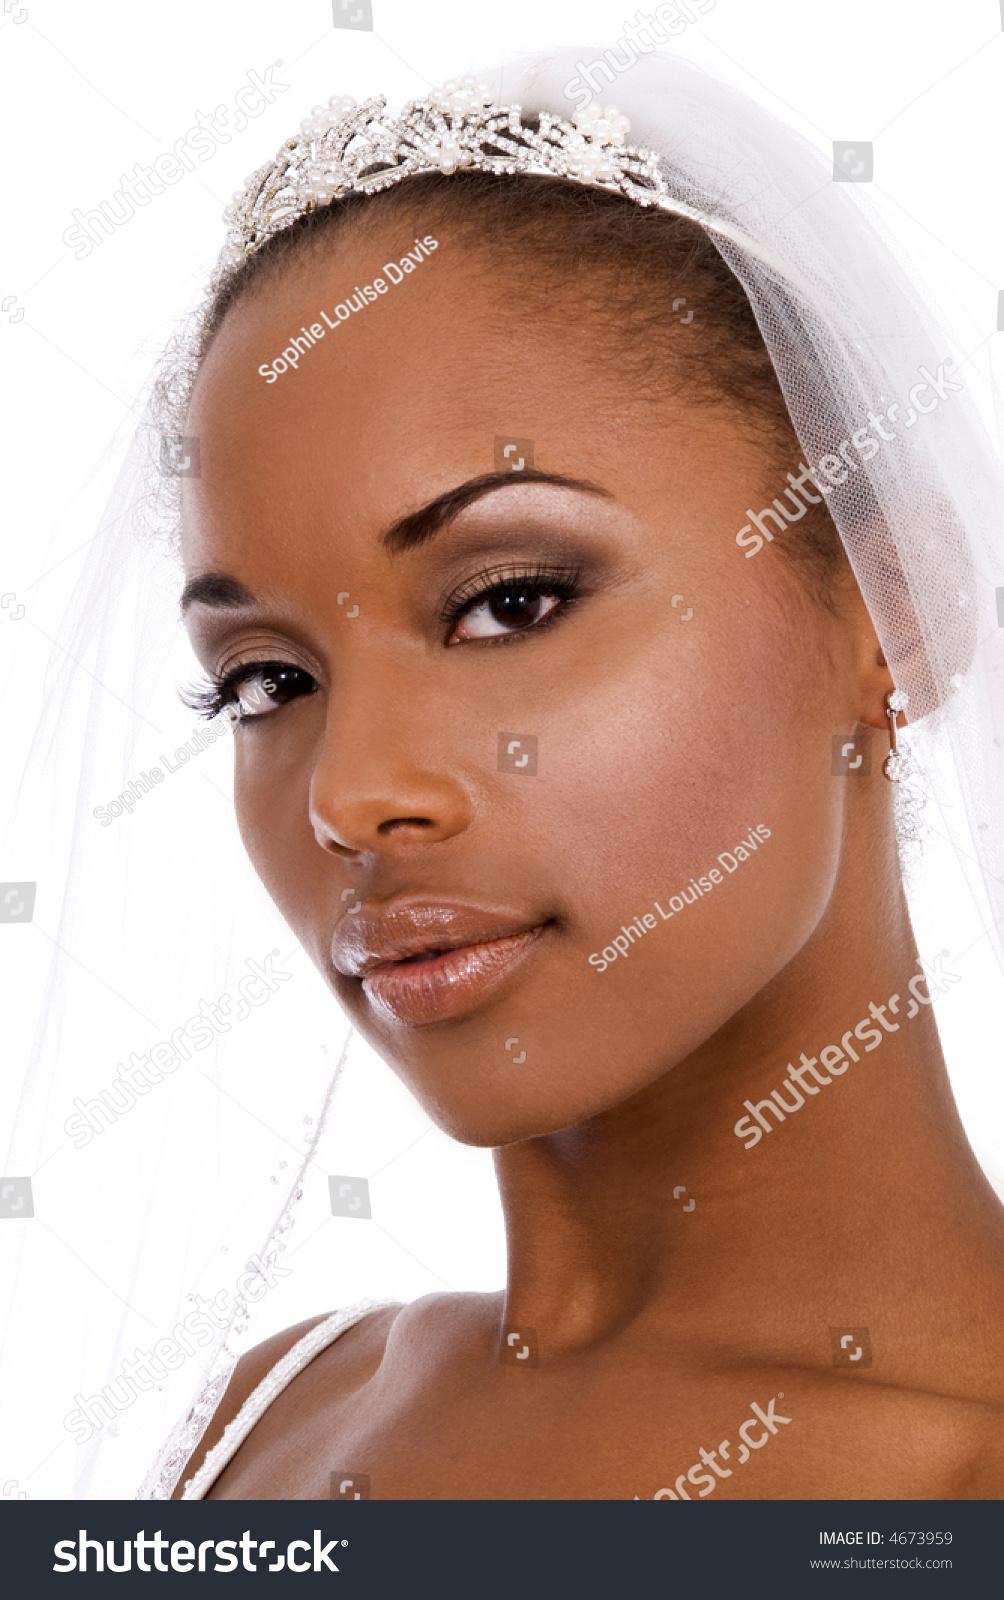 Photos Shutterstock Beautiful Bride Photos 110